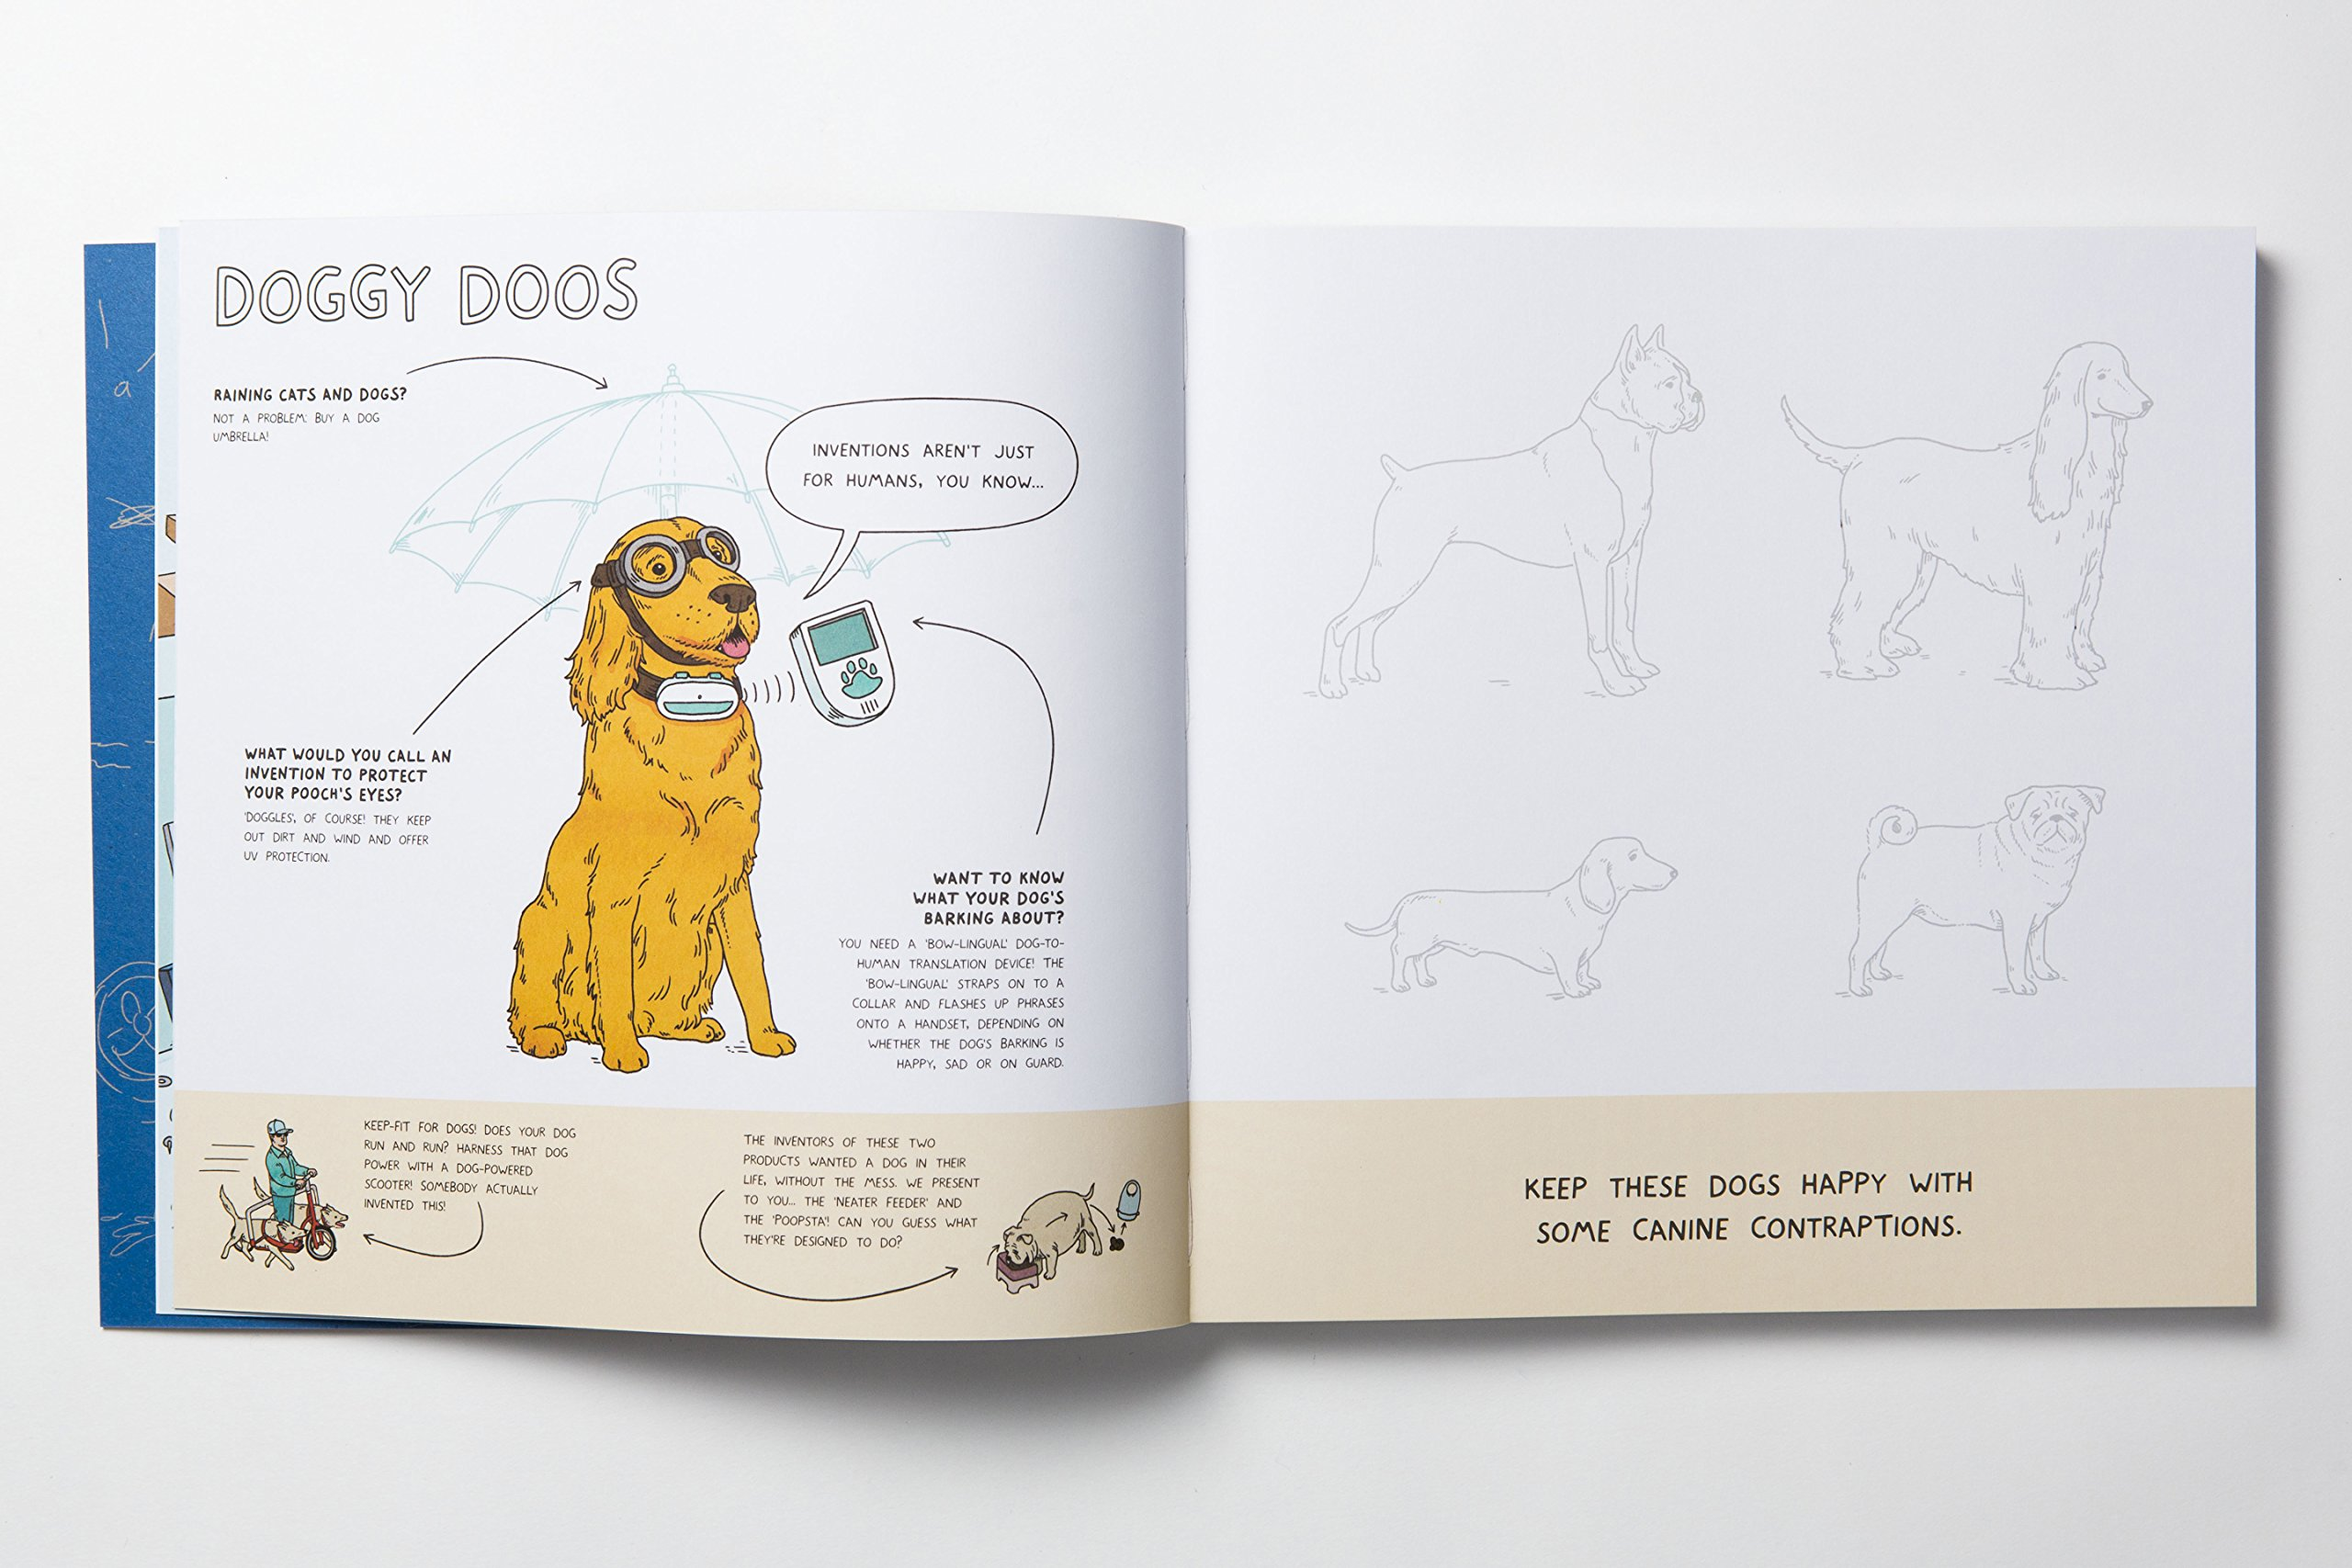 My Crazy Inventions Sketchbook: 50 Awesome Drawing Activities for Young Inventors: Amazon.es: Lisa Regan, Andrew Rae: Libros en idiomas extranjeros